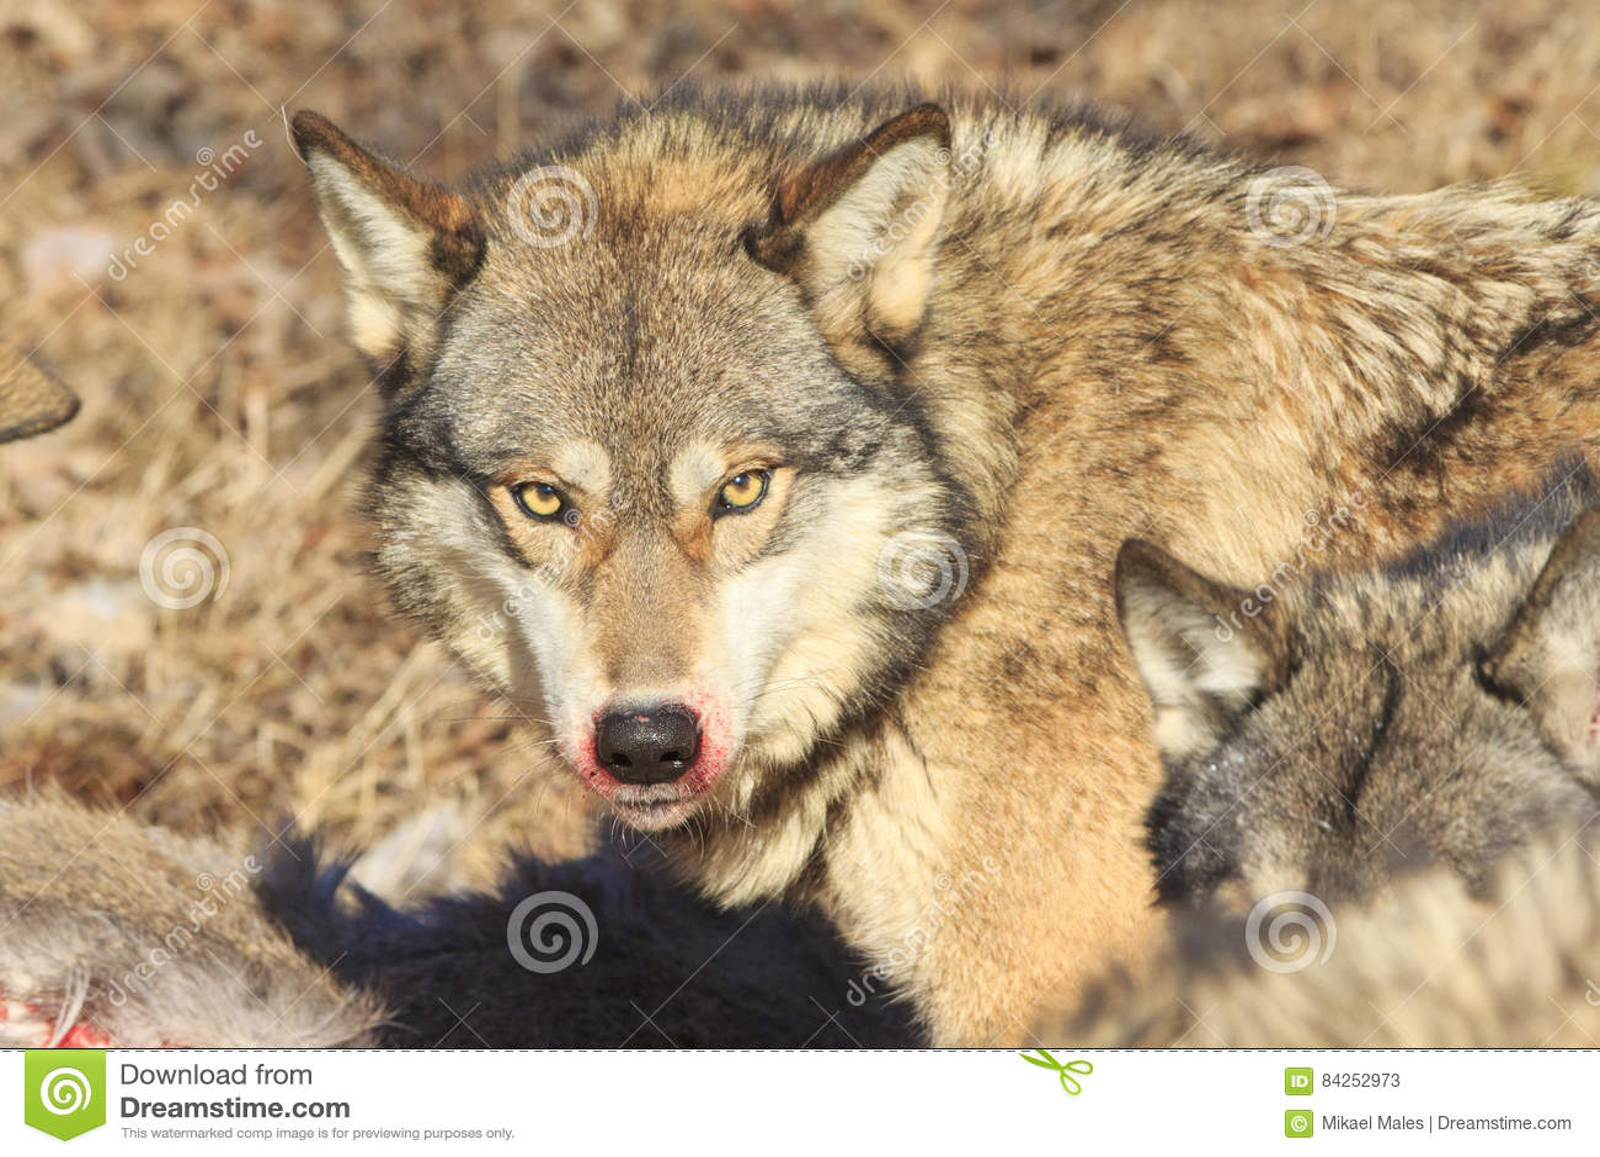 Bloody mane of wolf